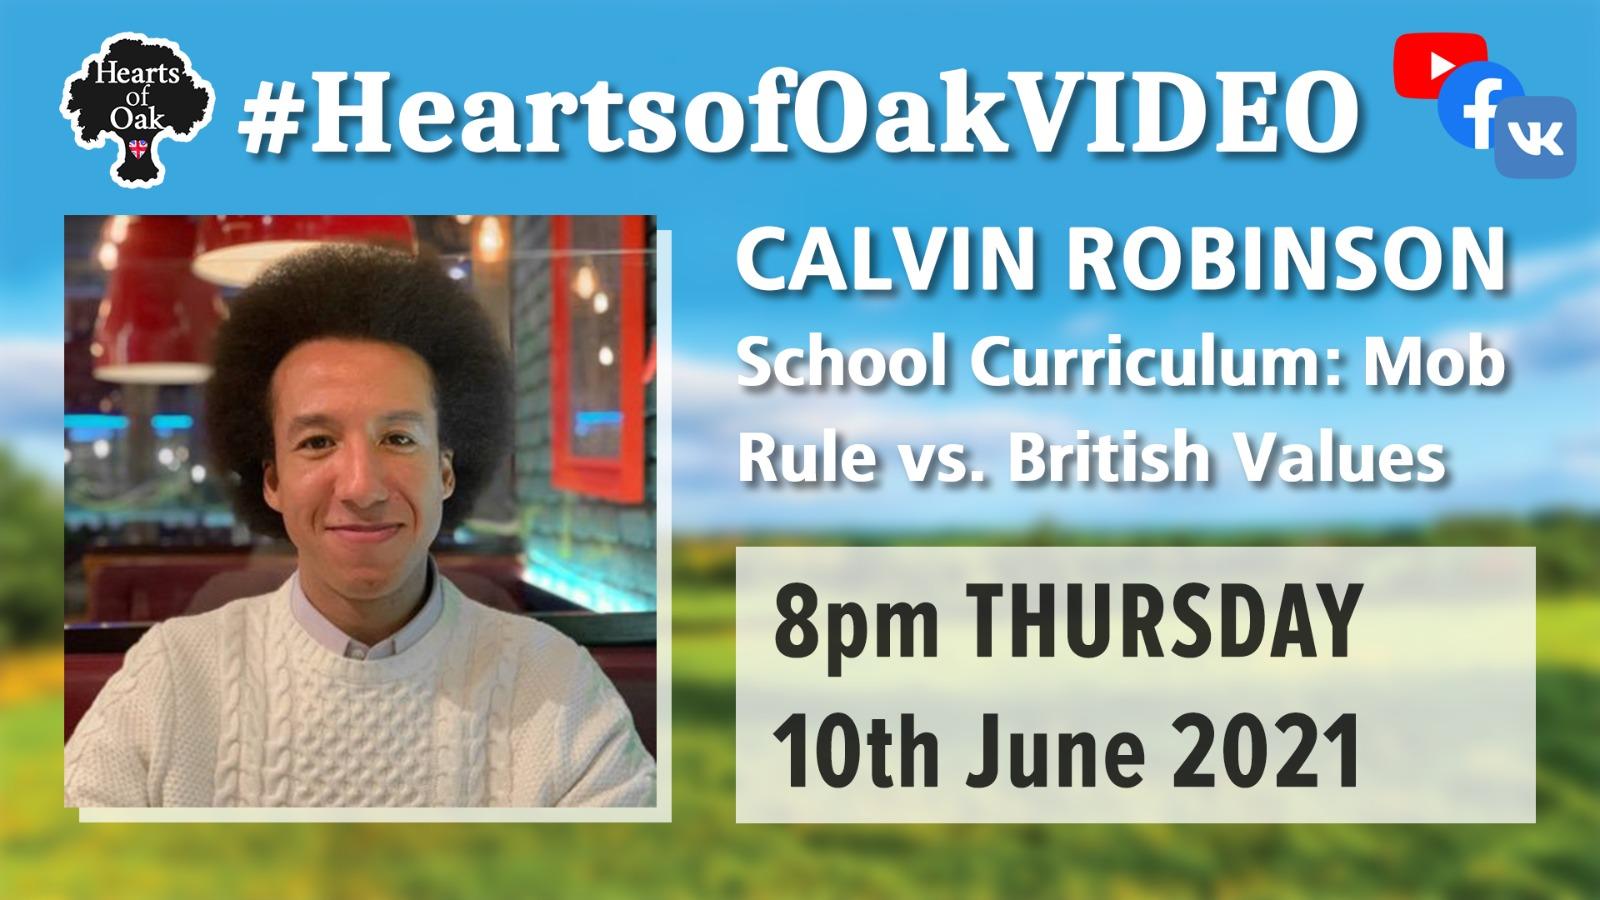 Calvin Robinson: School Curriculum; Mob Rule vs British Values